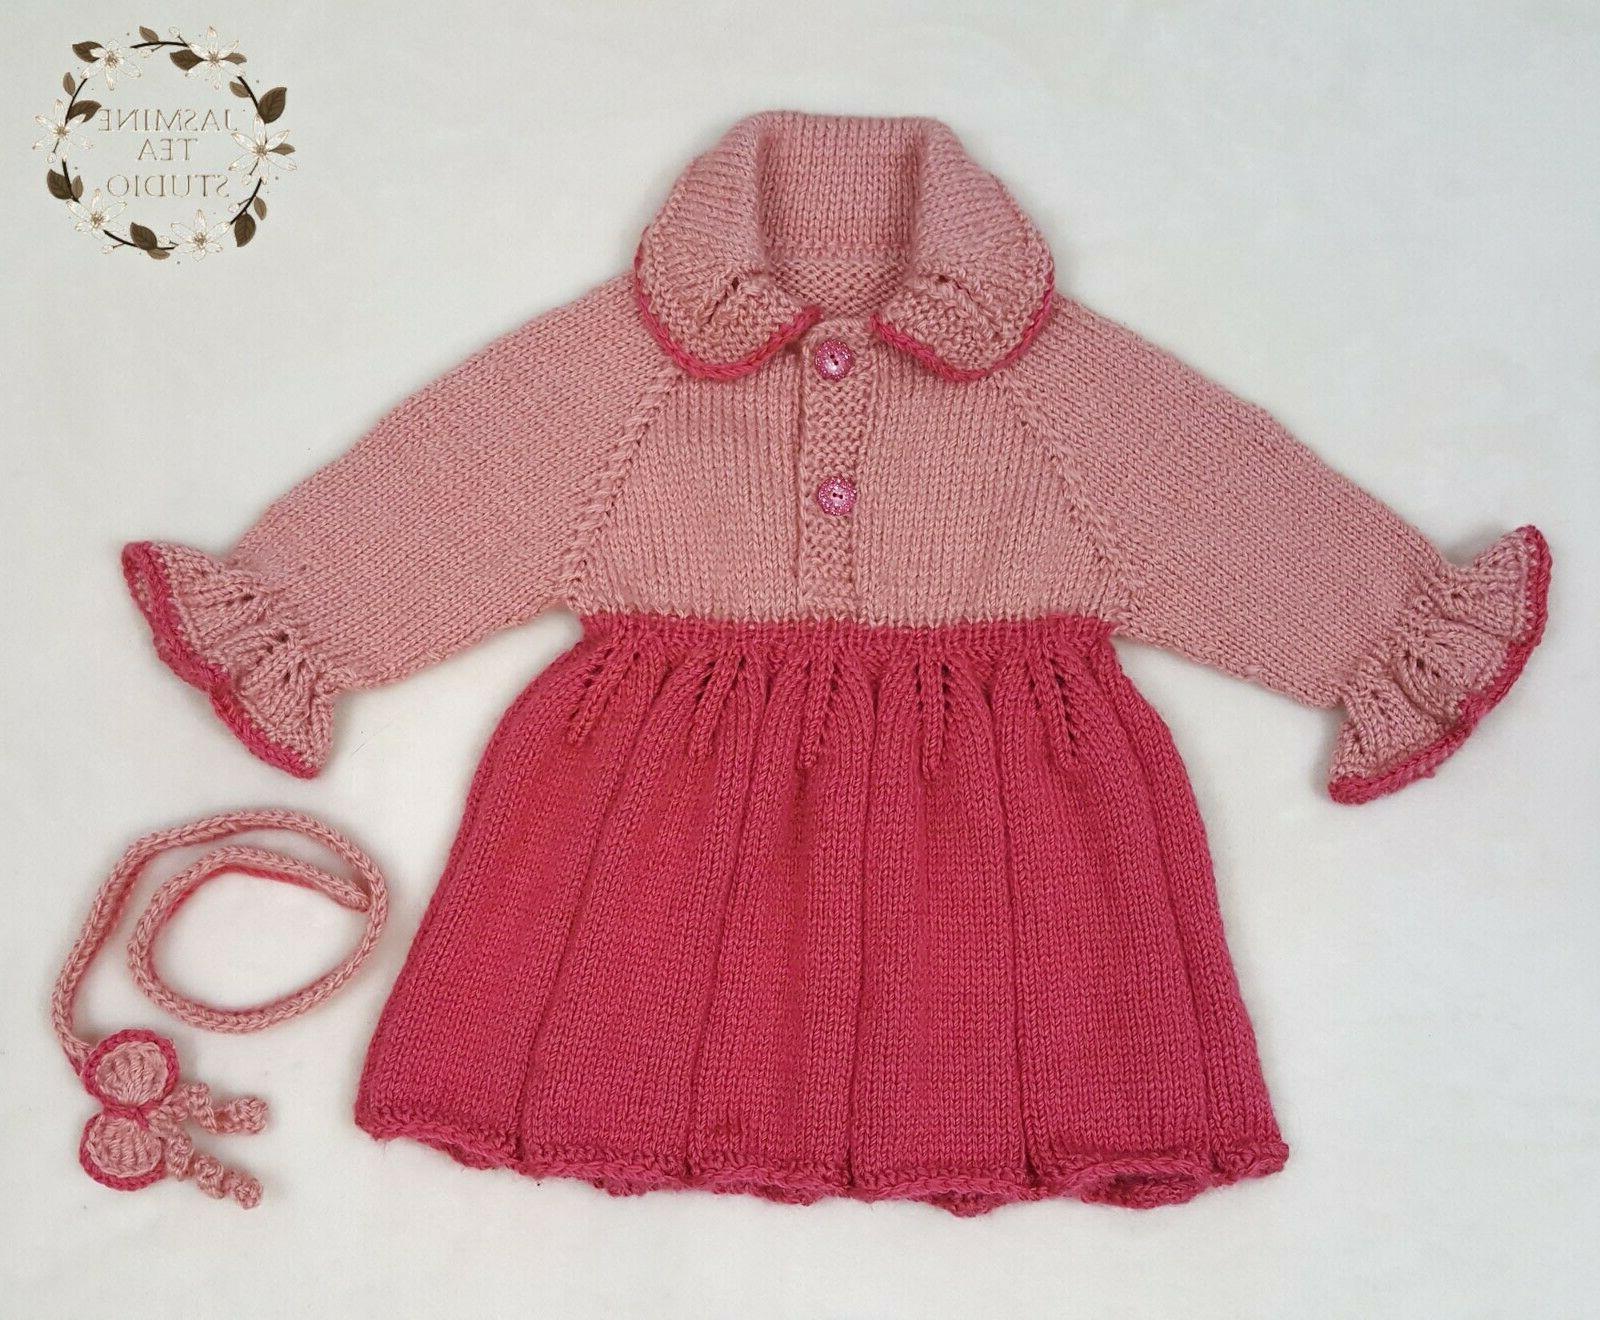 Baby Dress Outfit Shower Gift Present Crochet Handmade